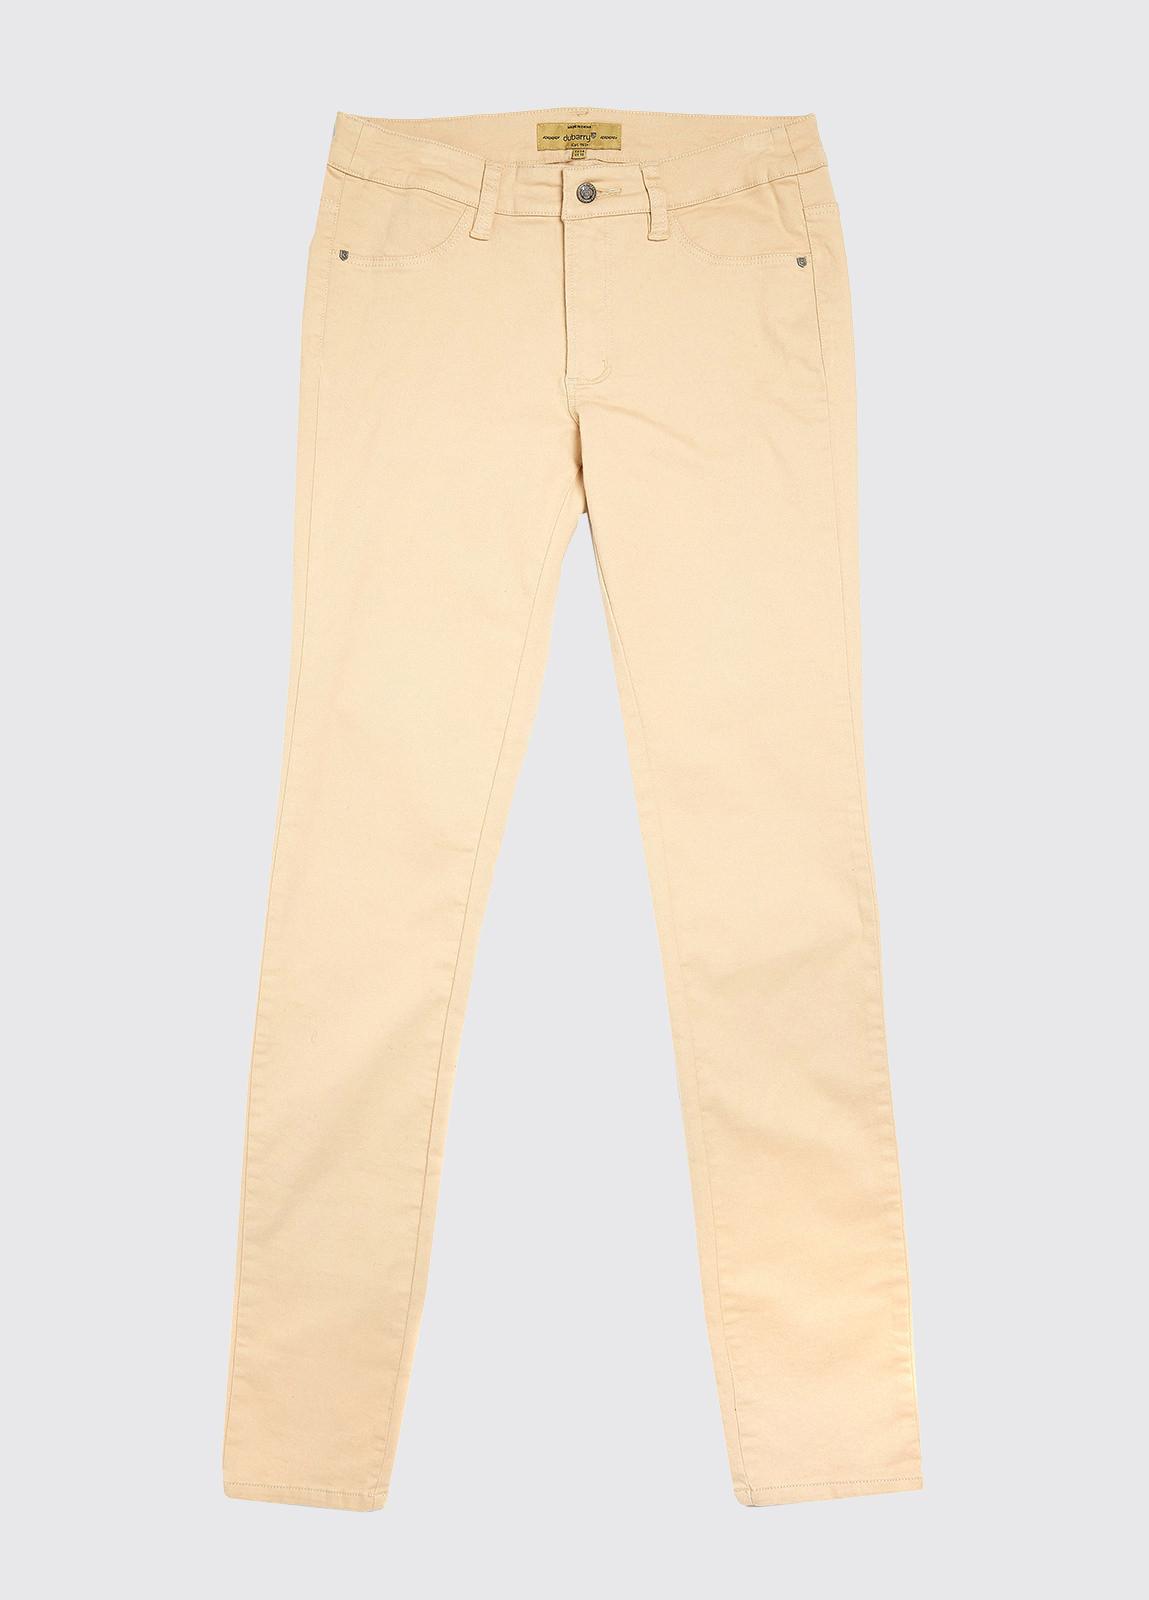 Hollyfern Jeans - Sand